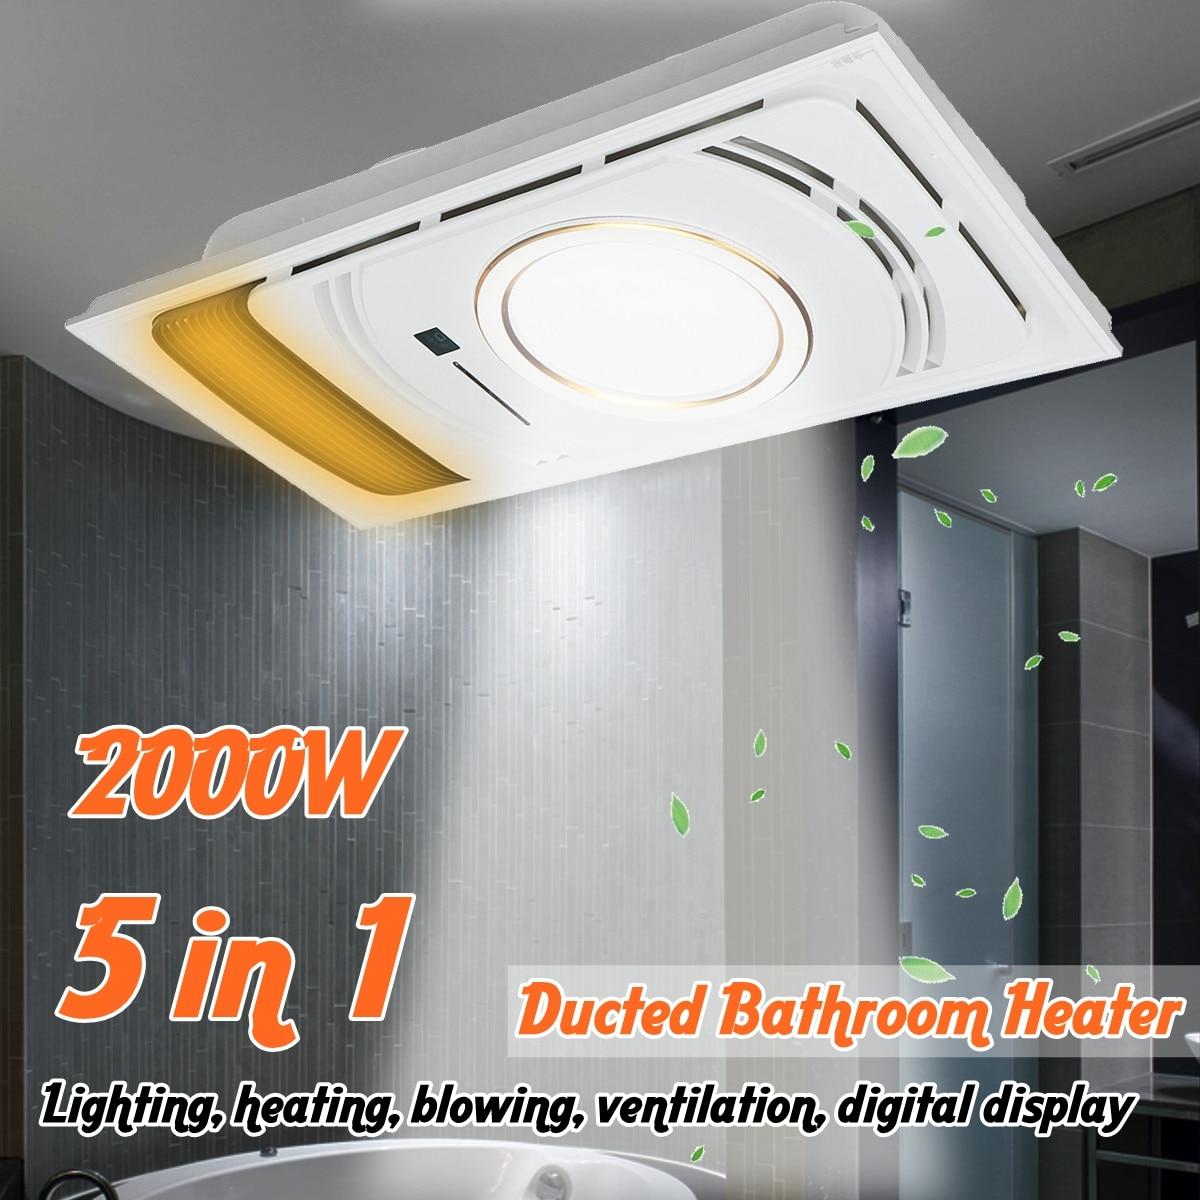 220V 2KW 5 In 1 Multi-functional Ducted Bathroom He